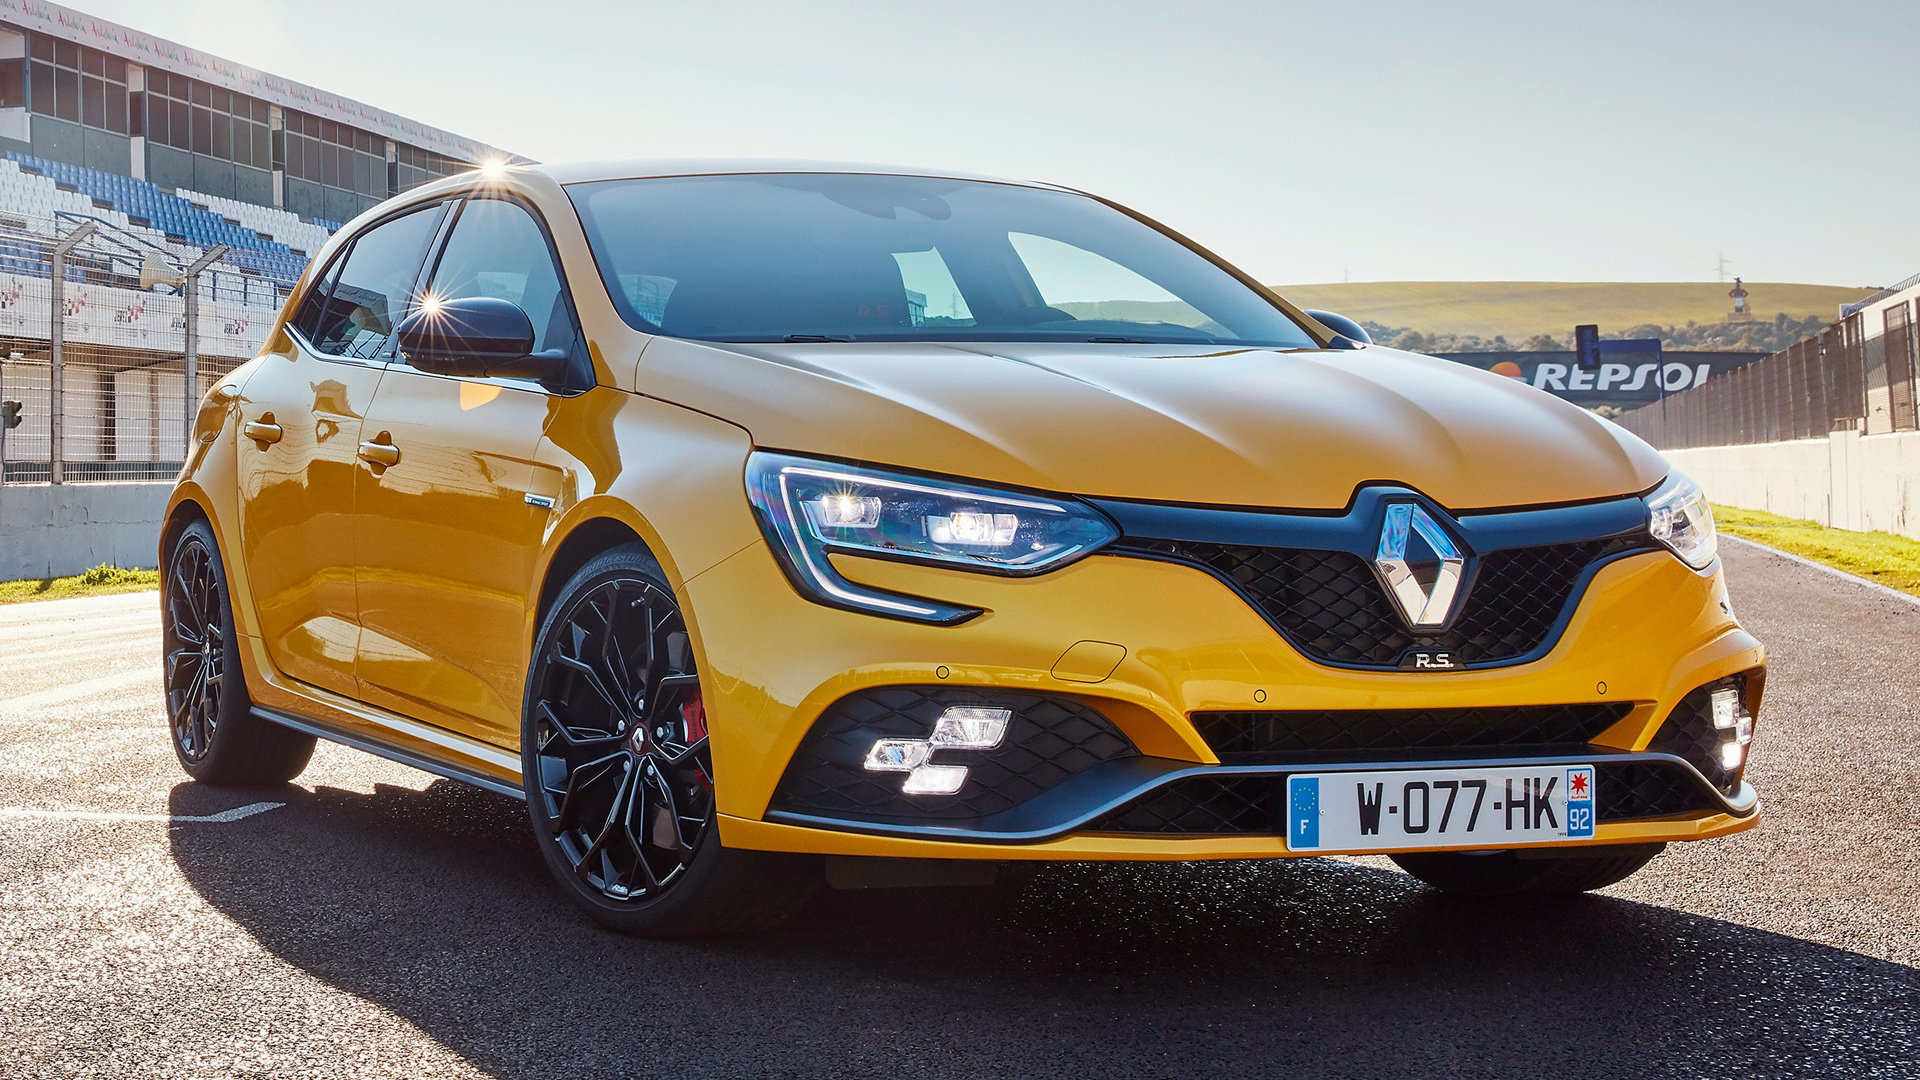 2018 Renault Megane Rs Wallpapers And Hd Images Car Pixel